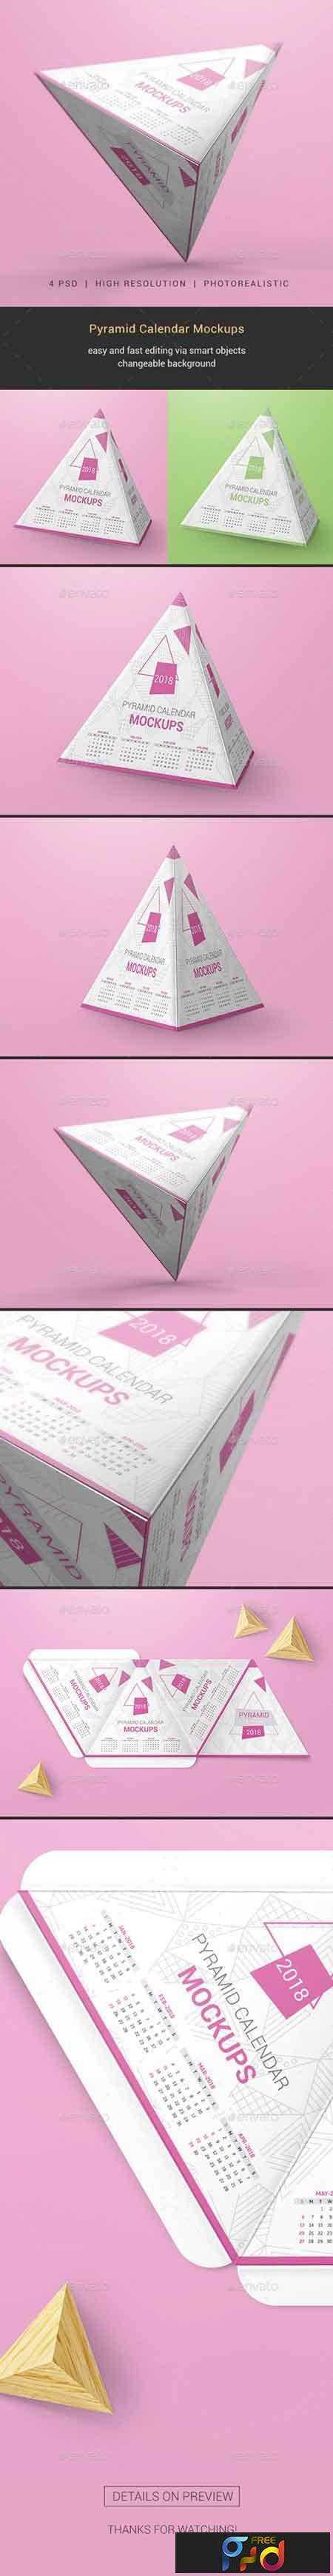 FreePsdVn.com_1705077_MOCKUP_pyramid_calendar_mockups_20544879